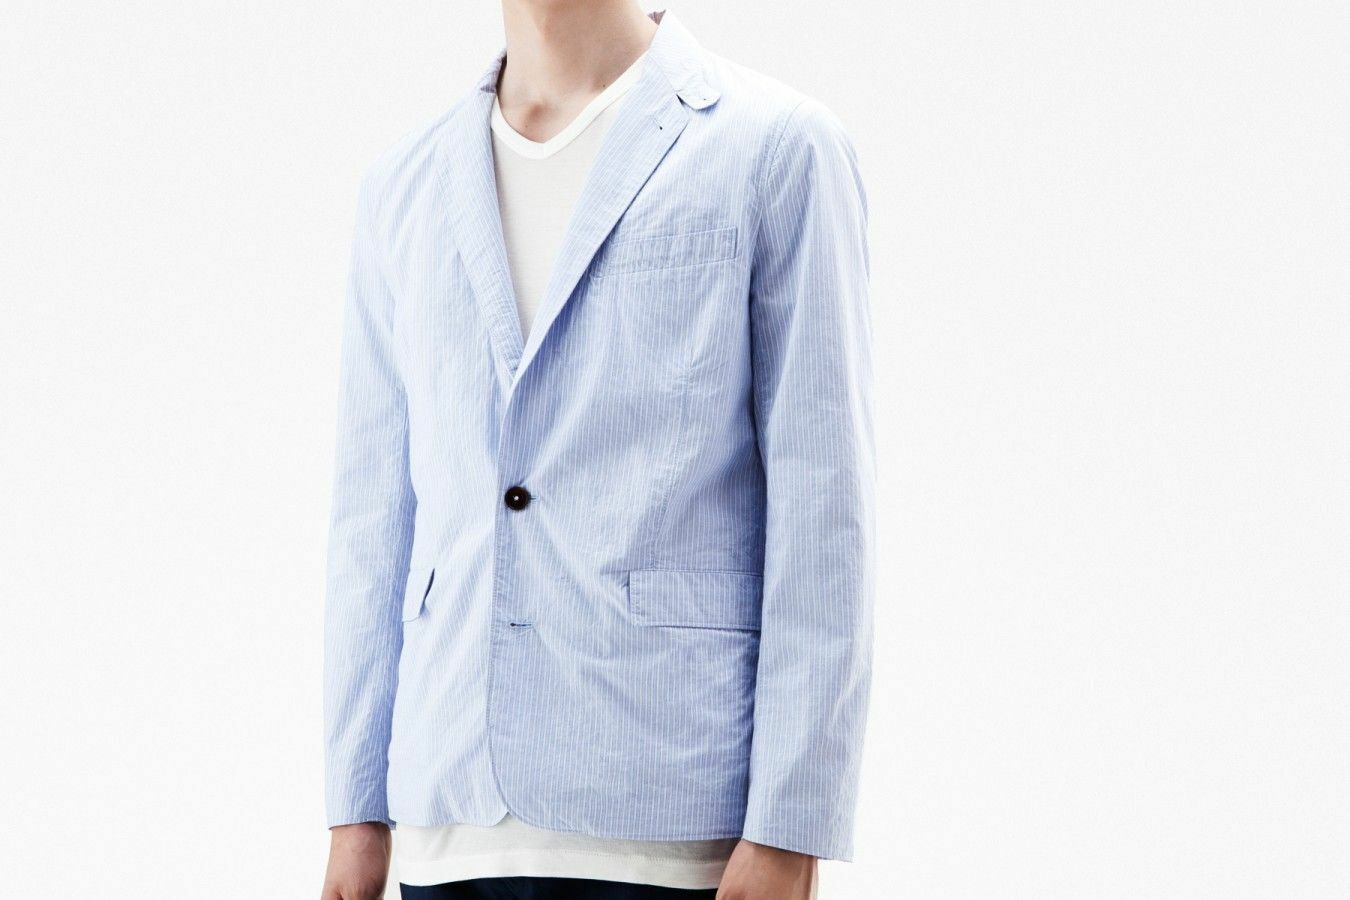 Acne Dandy Blau Stripe Blazer, Größe 50 - BNWT,